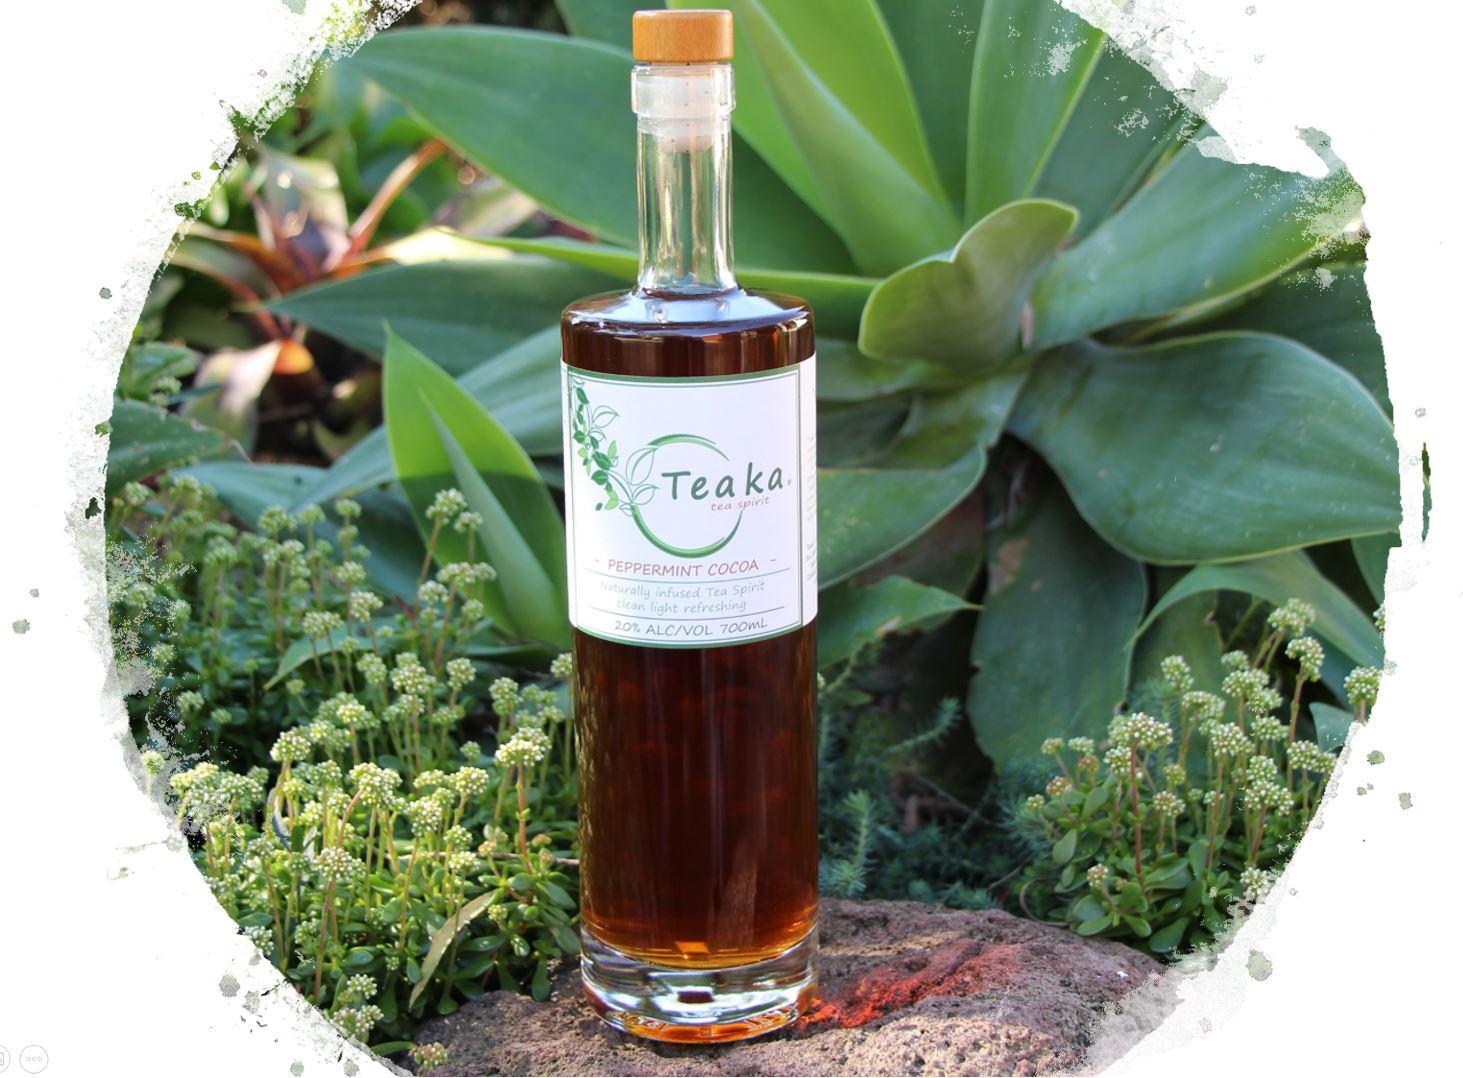 Teaka Peppermint Cocoa Tea Spirit - alcoholic tea spirit